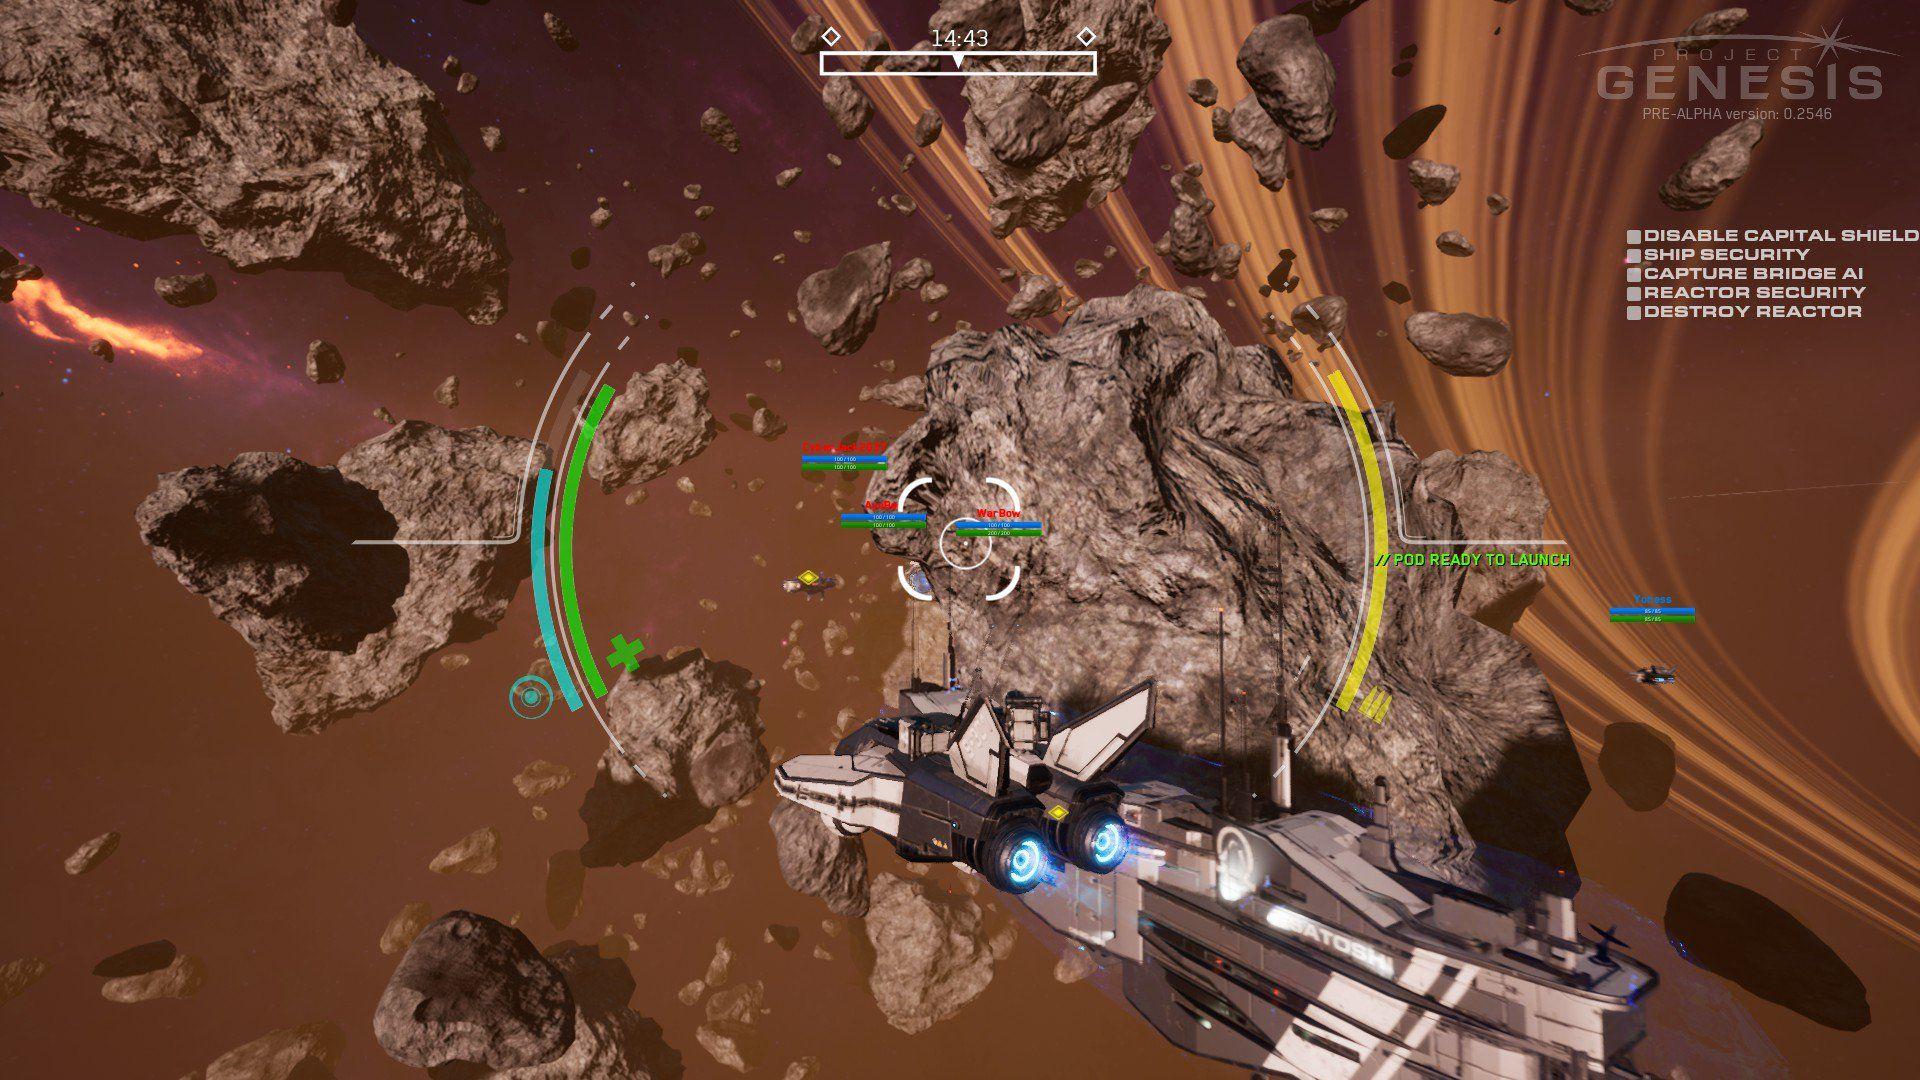 Project Genesis Mixes FPS Combat with Intense Ship Battles